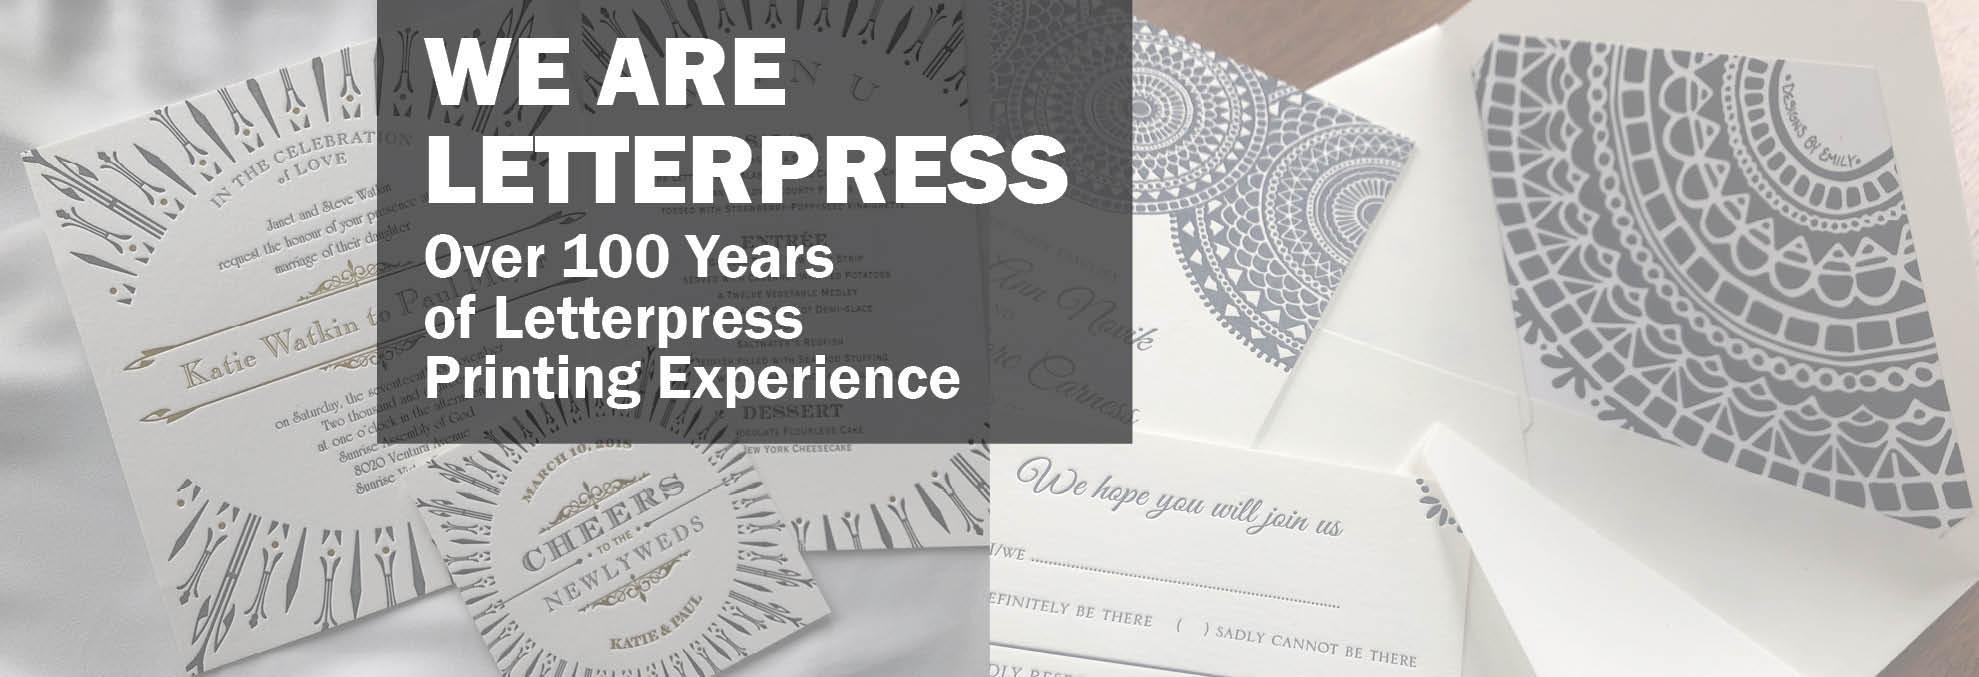 Cheap Letterpress Wedding Invitations: Affordable And Elegant Custom Letterpress Wedding Invitations